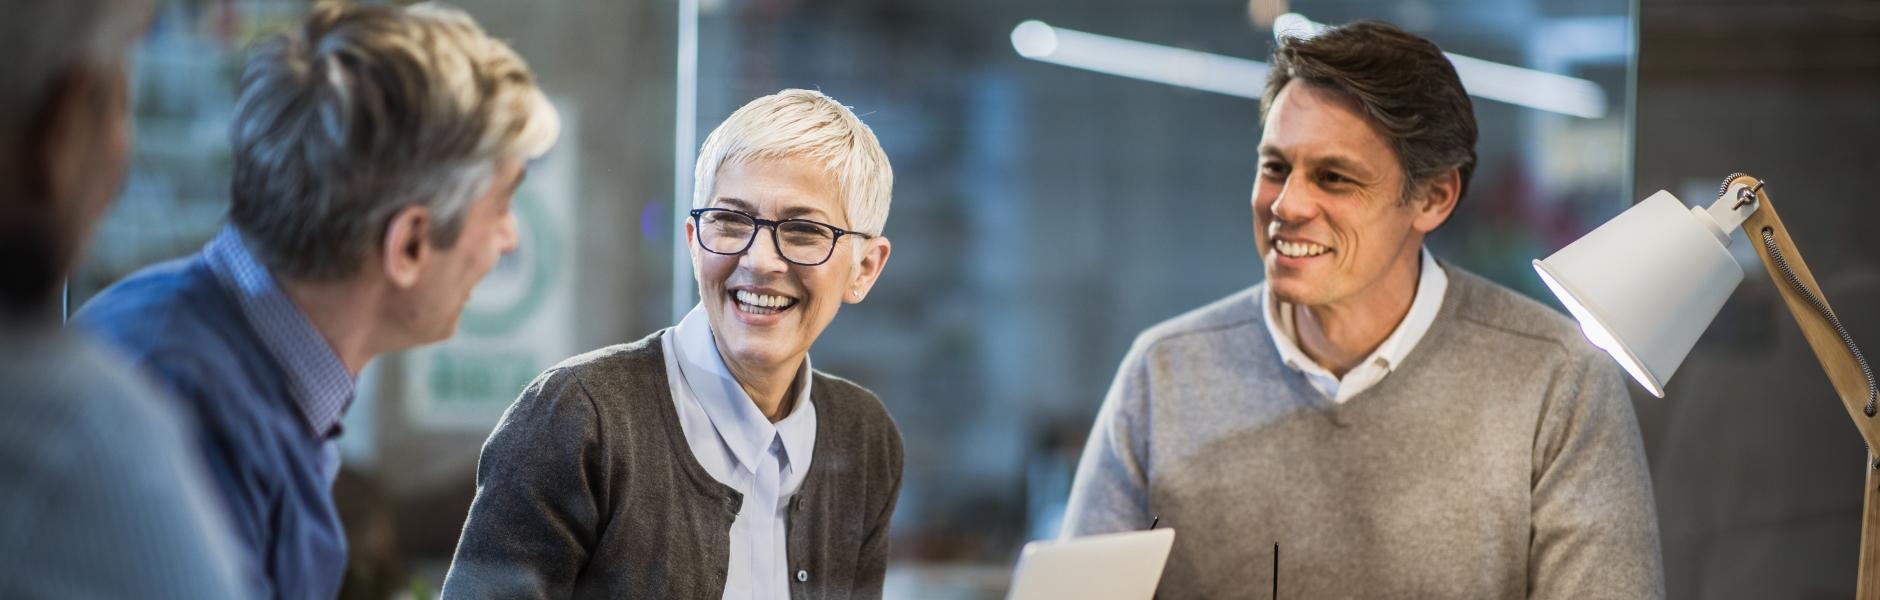 colleagues-digital-transformation